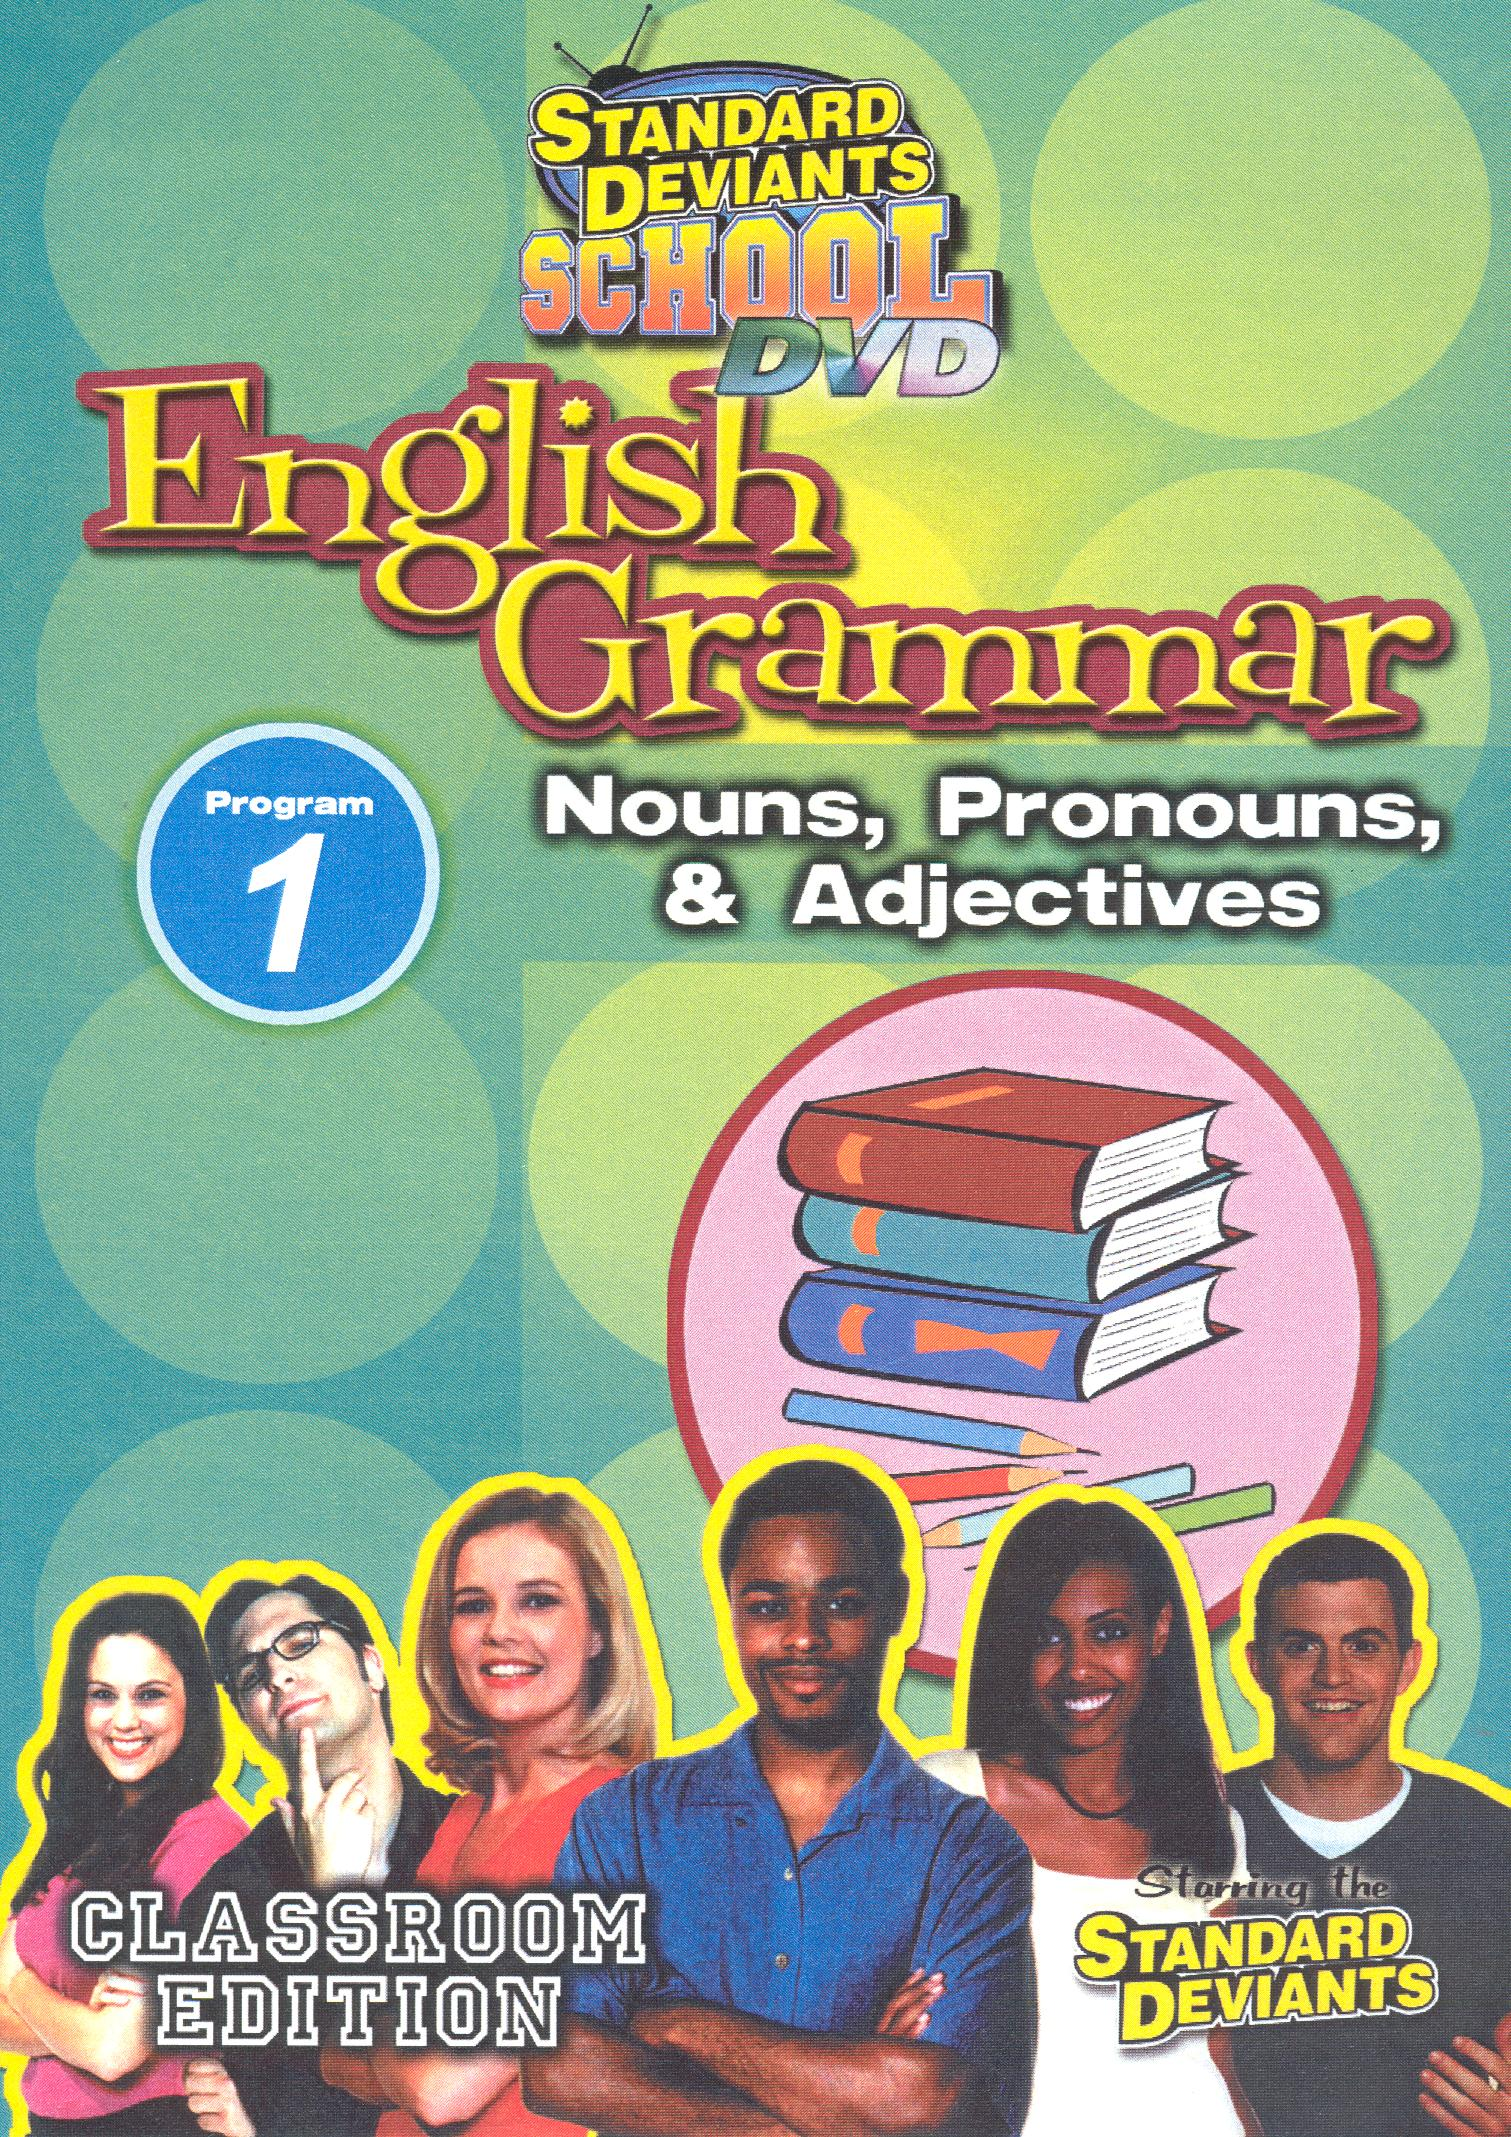 Standard Deviants School: English Grammar, Program 1